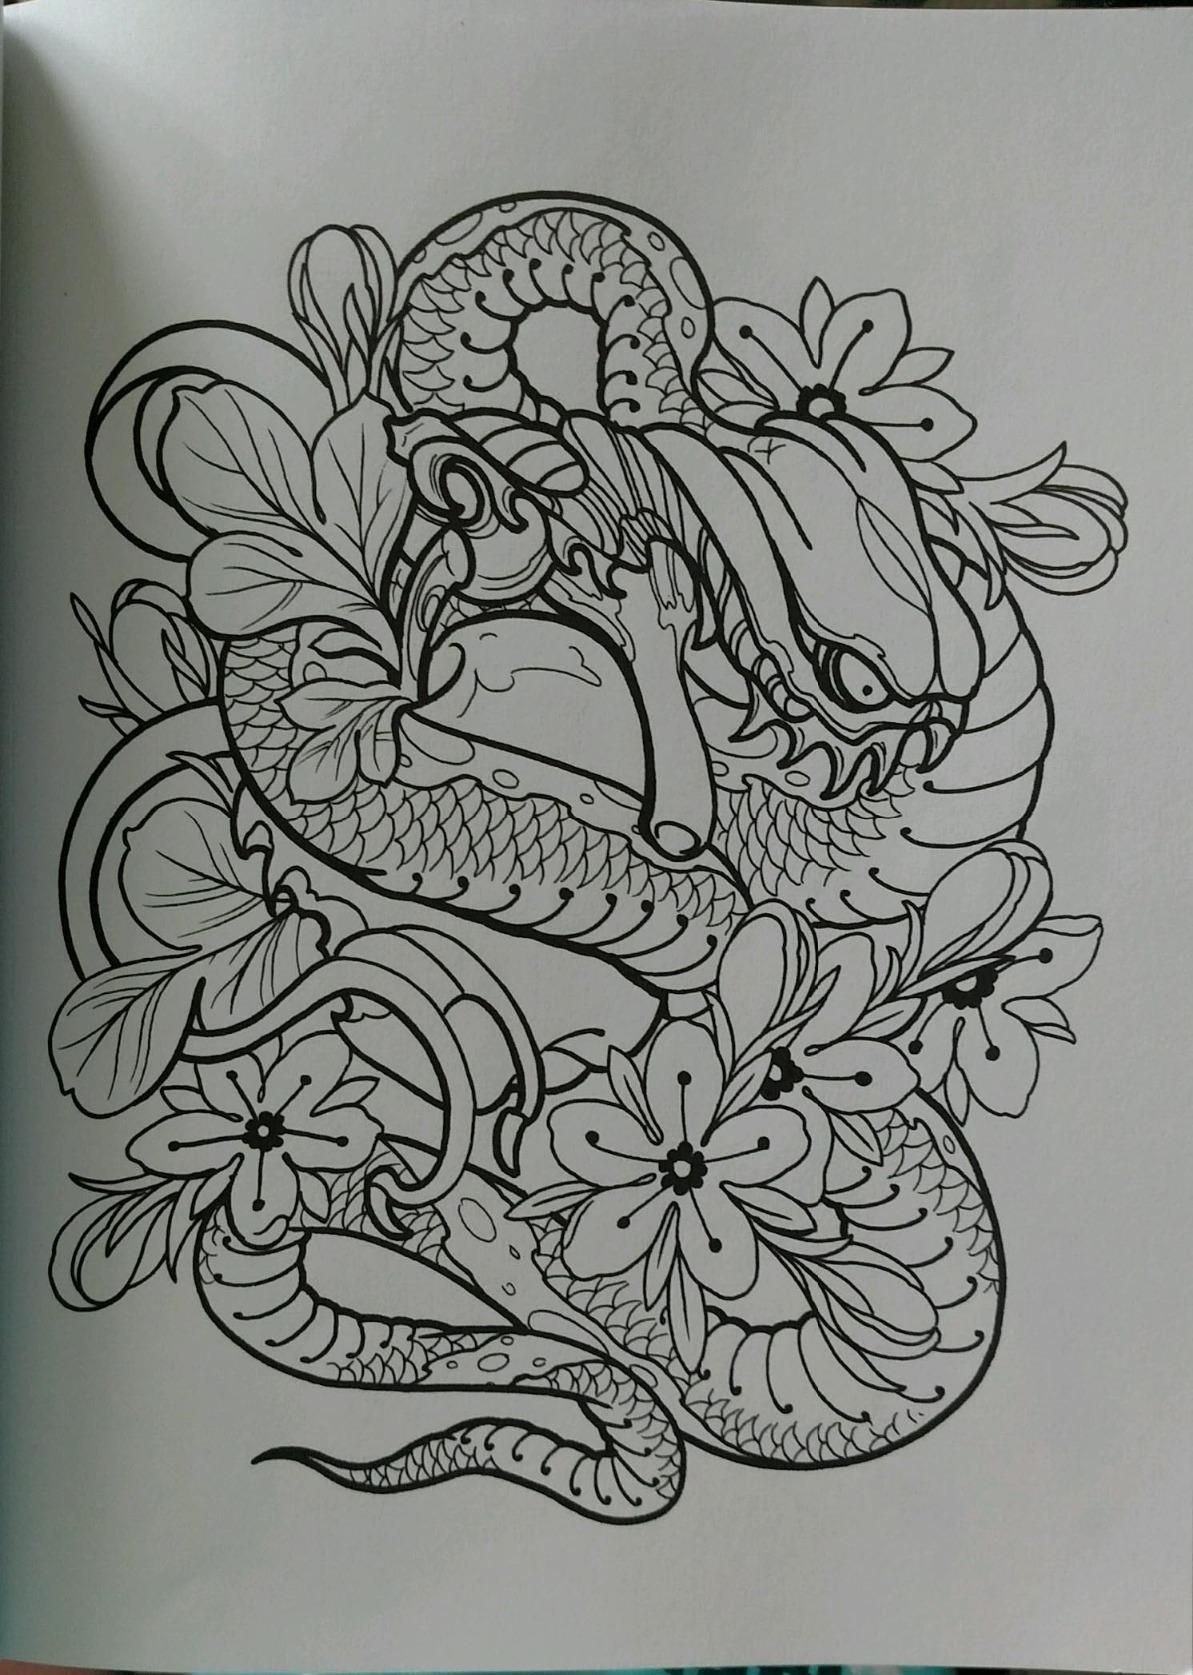 Tattoo designs coloring book - Creative Haven Modern Tattoo Designs Coloring Book Creative Haven Coloring Books Erik Siuda